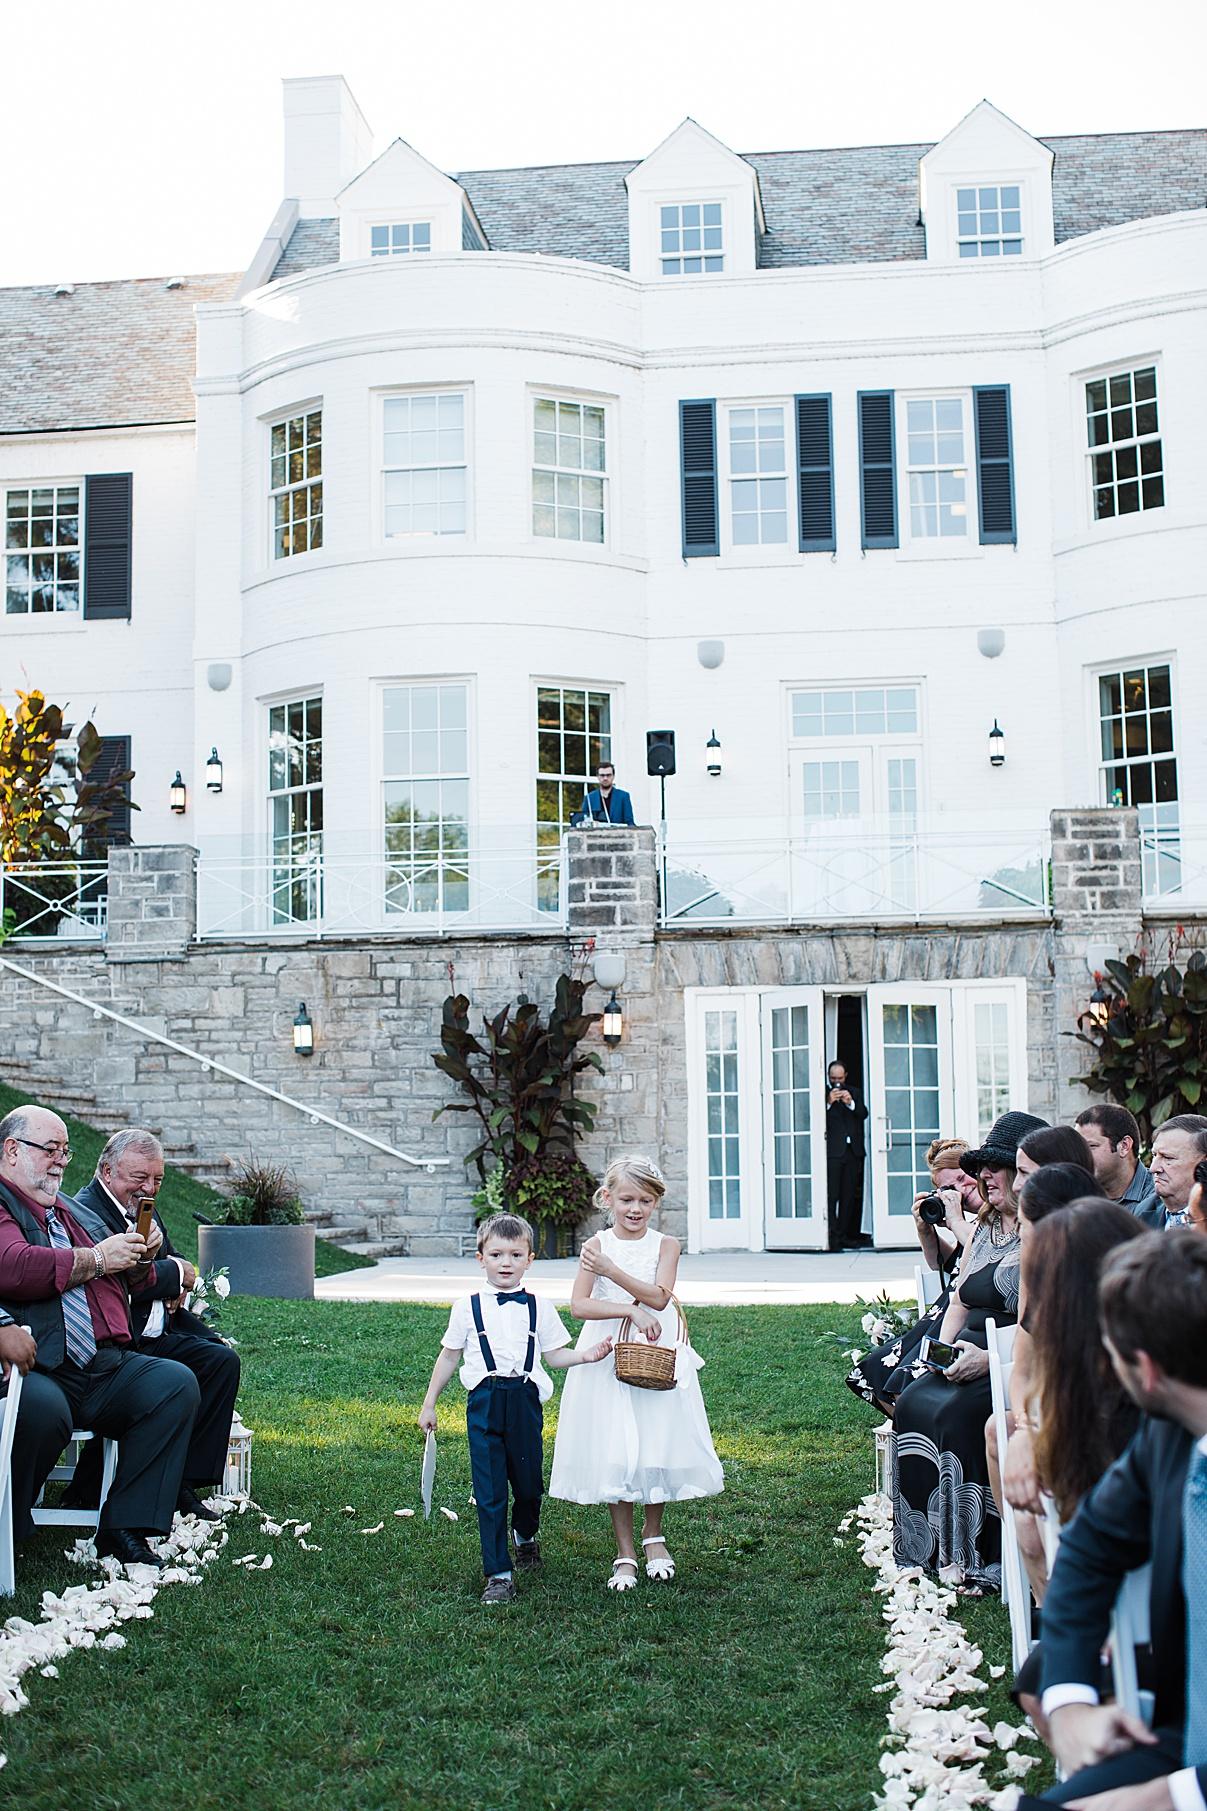 Flower girl and ring bearer walking down aisle| Harding Waterfront Estate Wedding| Ontario wedding photographer| Toronto wedding photographer| 3 Photography | 3photography.ca